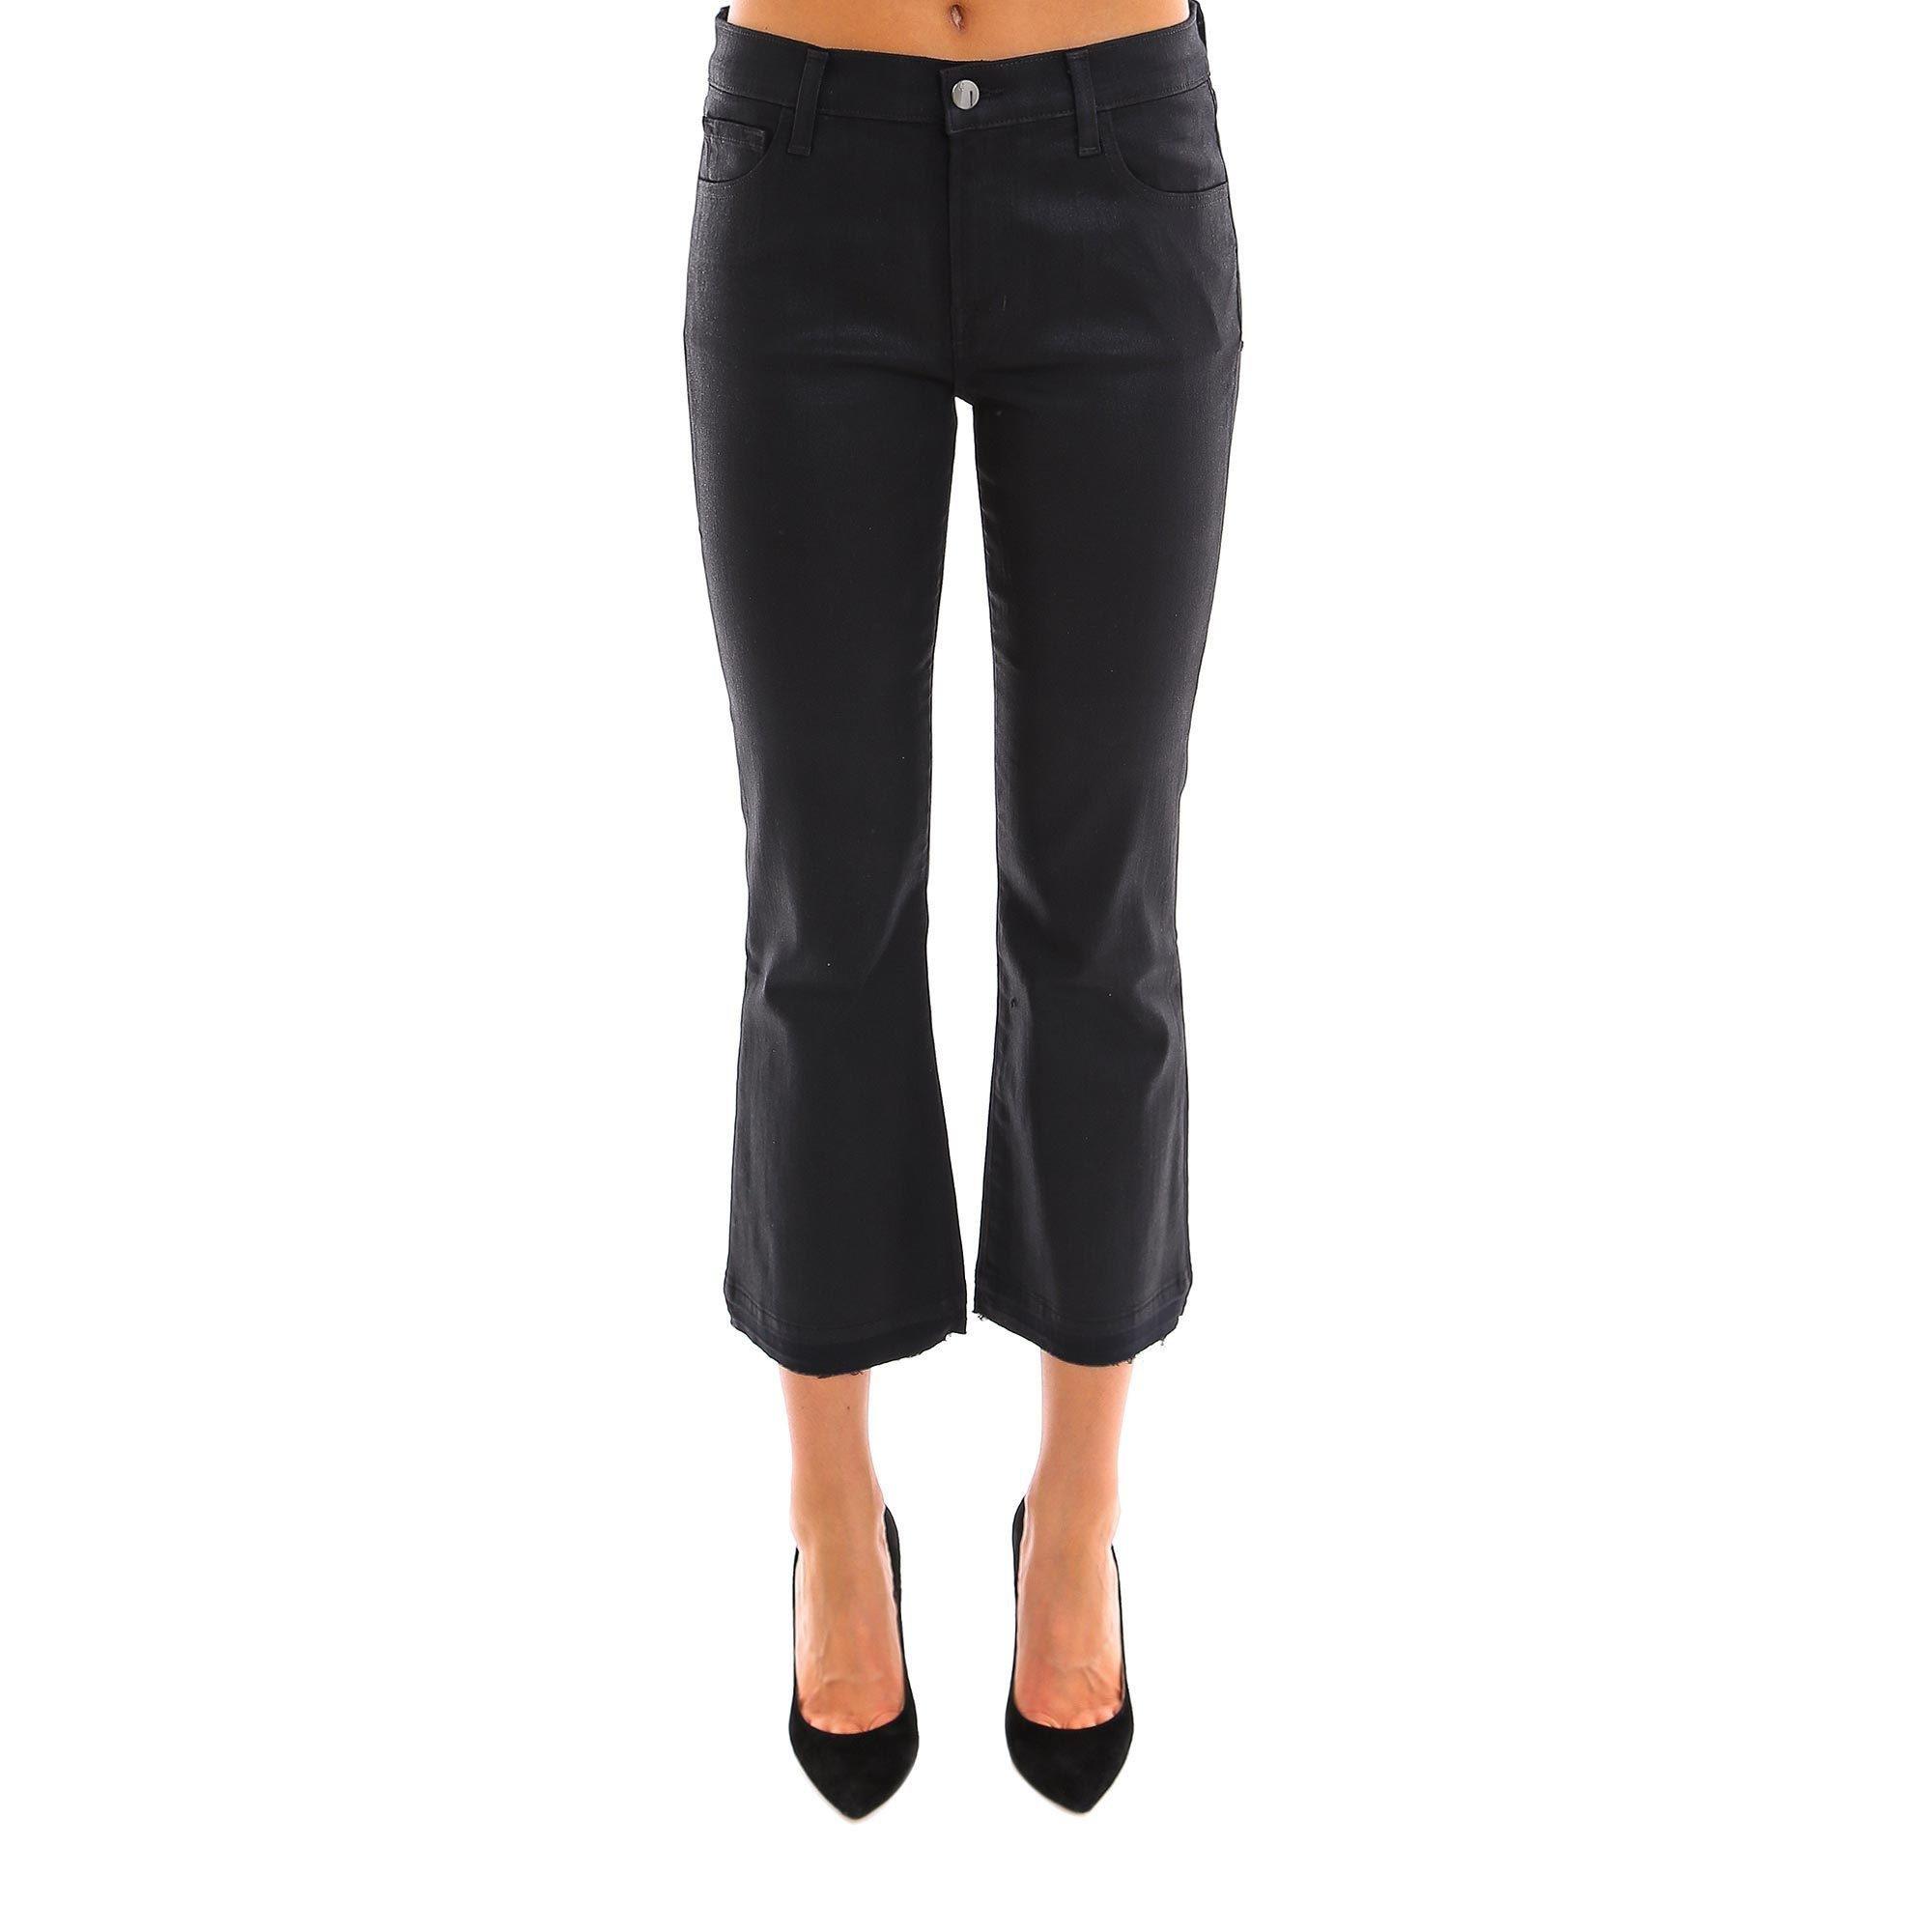 ba567e4a2cc3 Lyst - J Brand Selena Bootcut Flared Jeans in Black